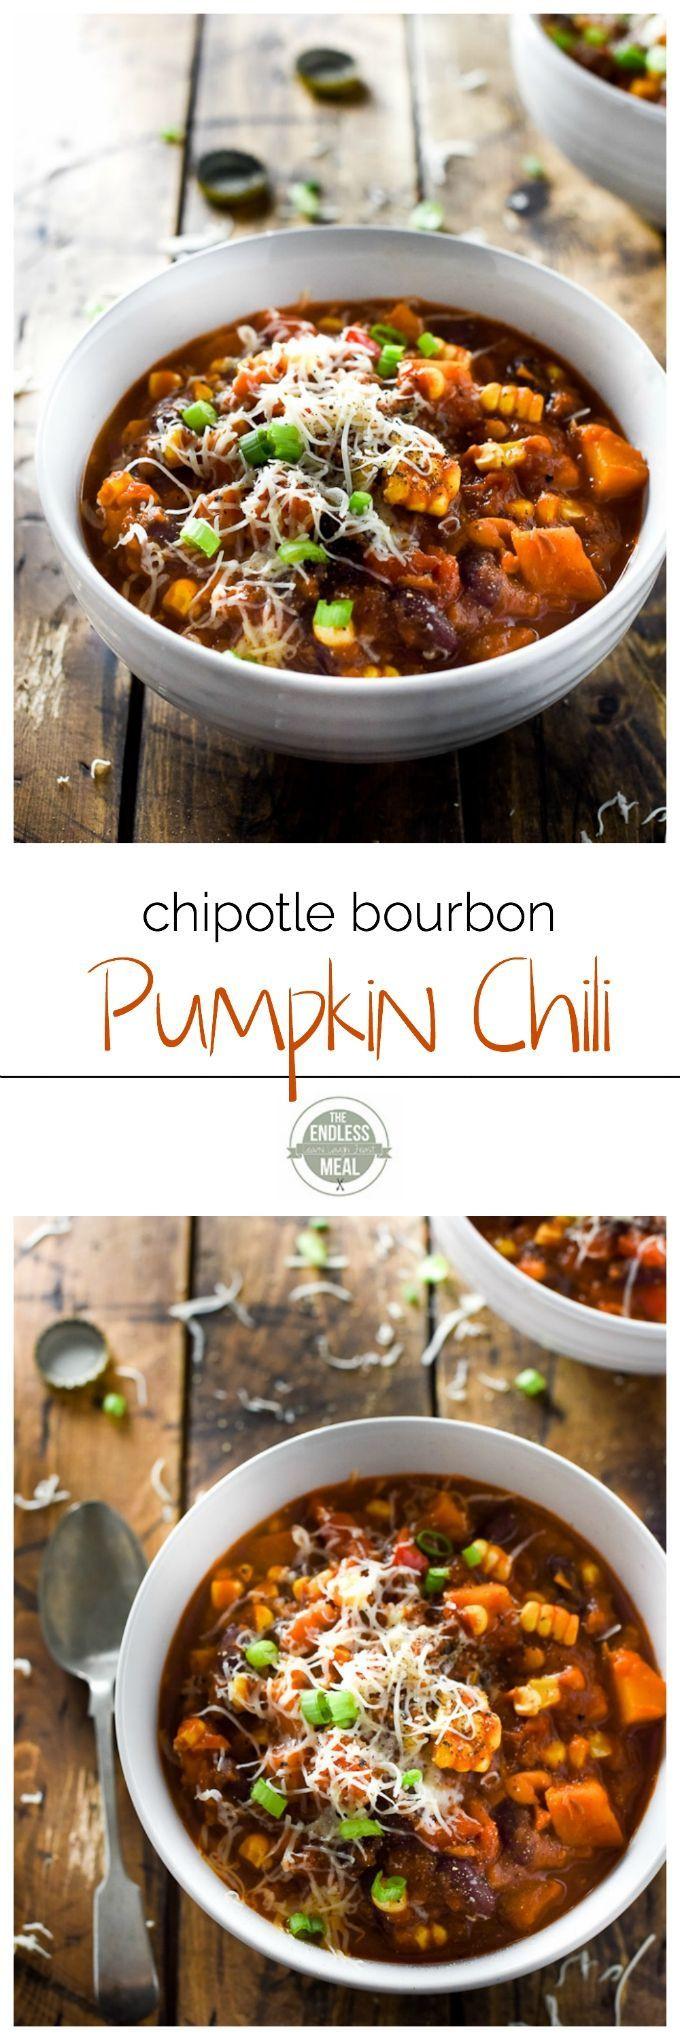 Vegetarian Fall Dinner Recipes  1000 ideas about Pumpkin Chili on Pinterest